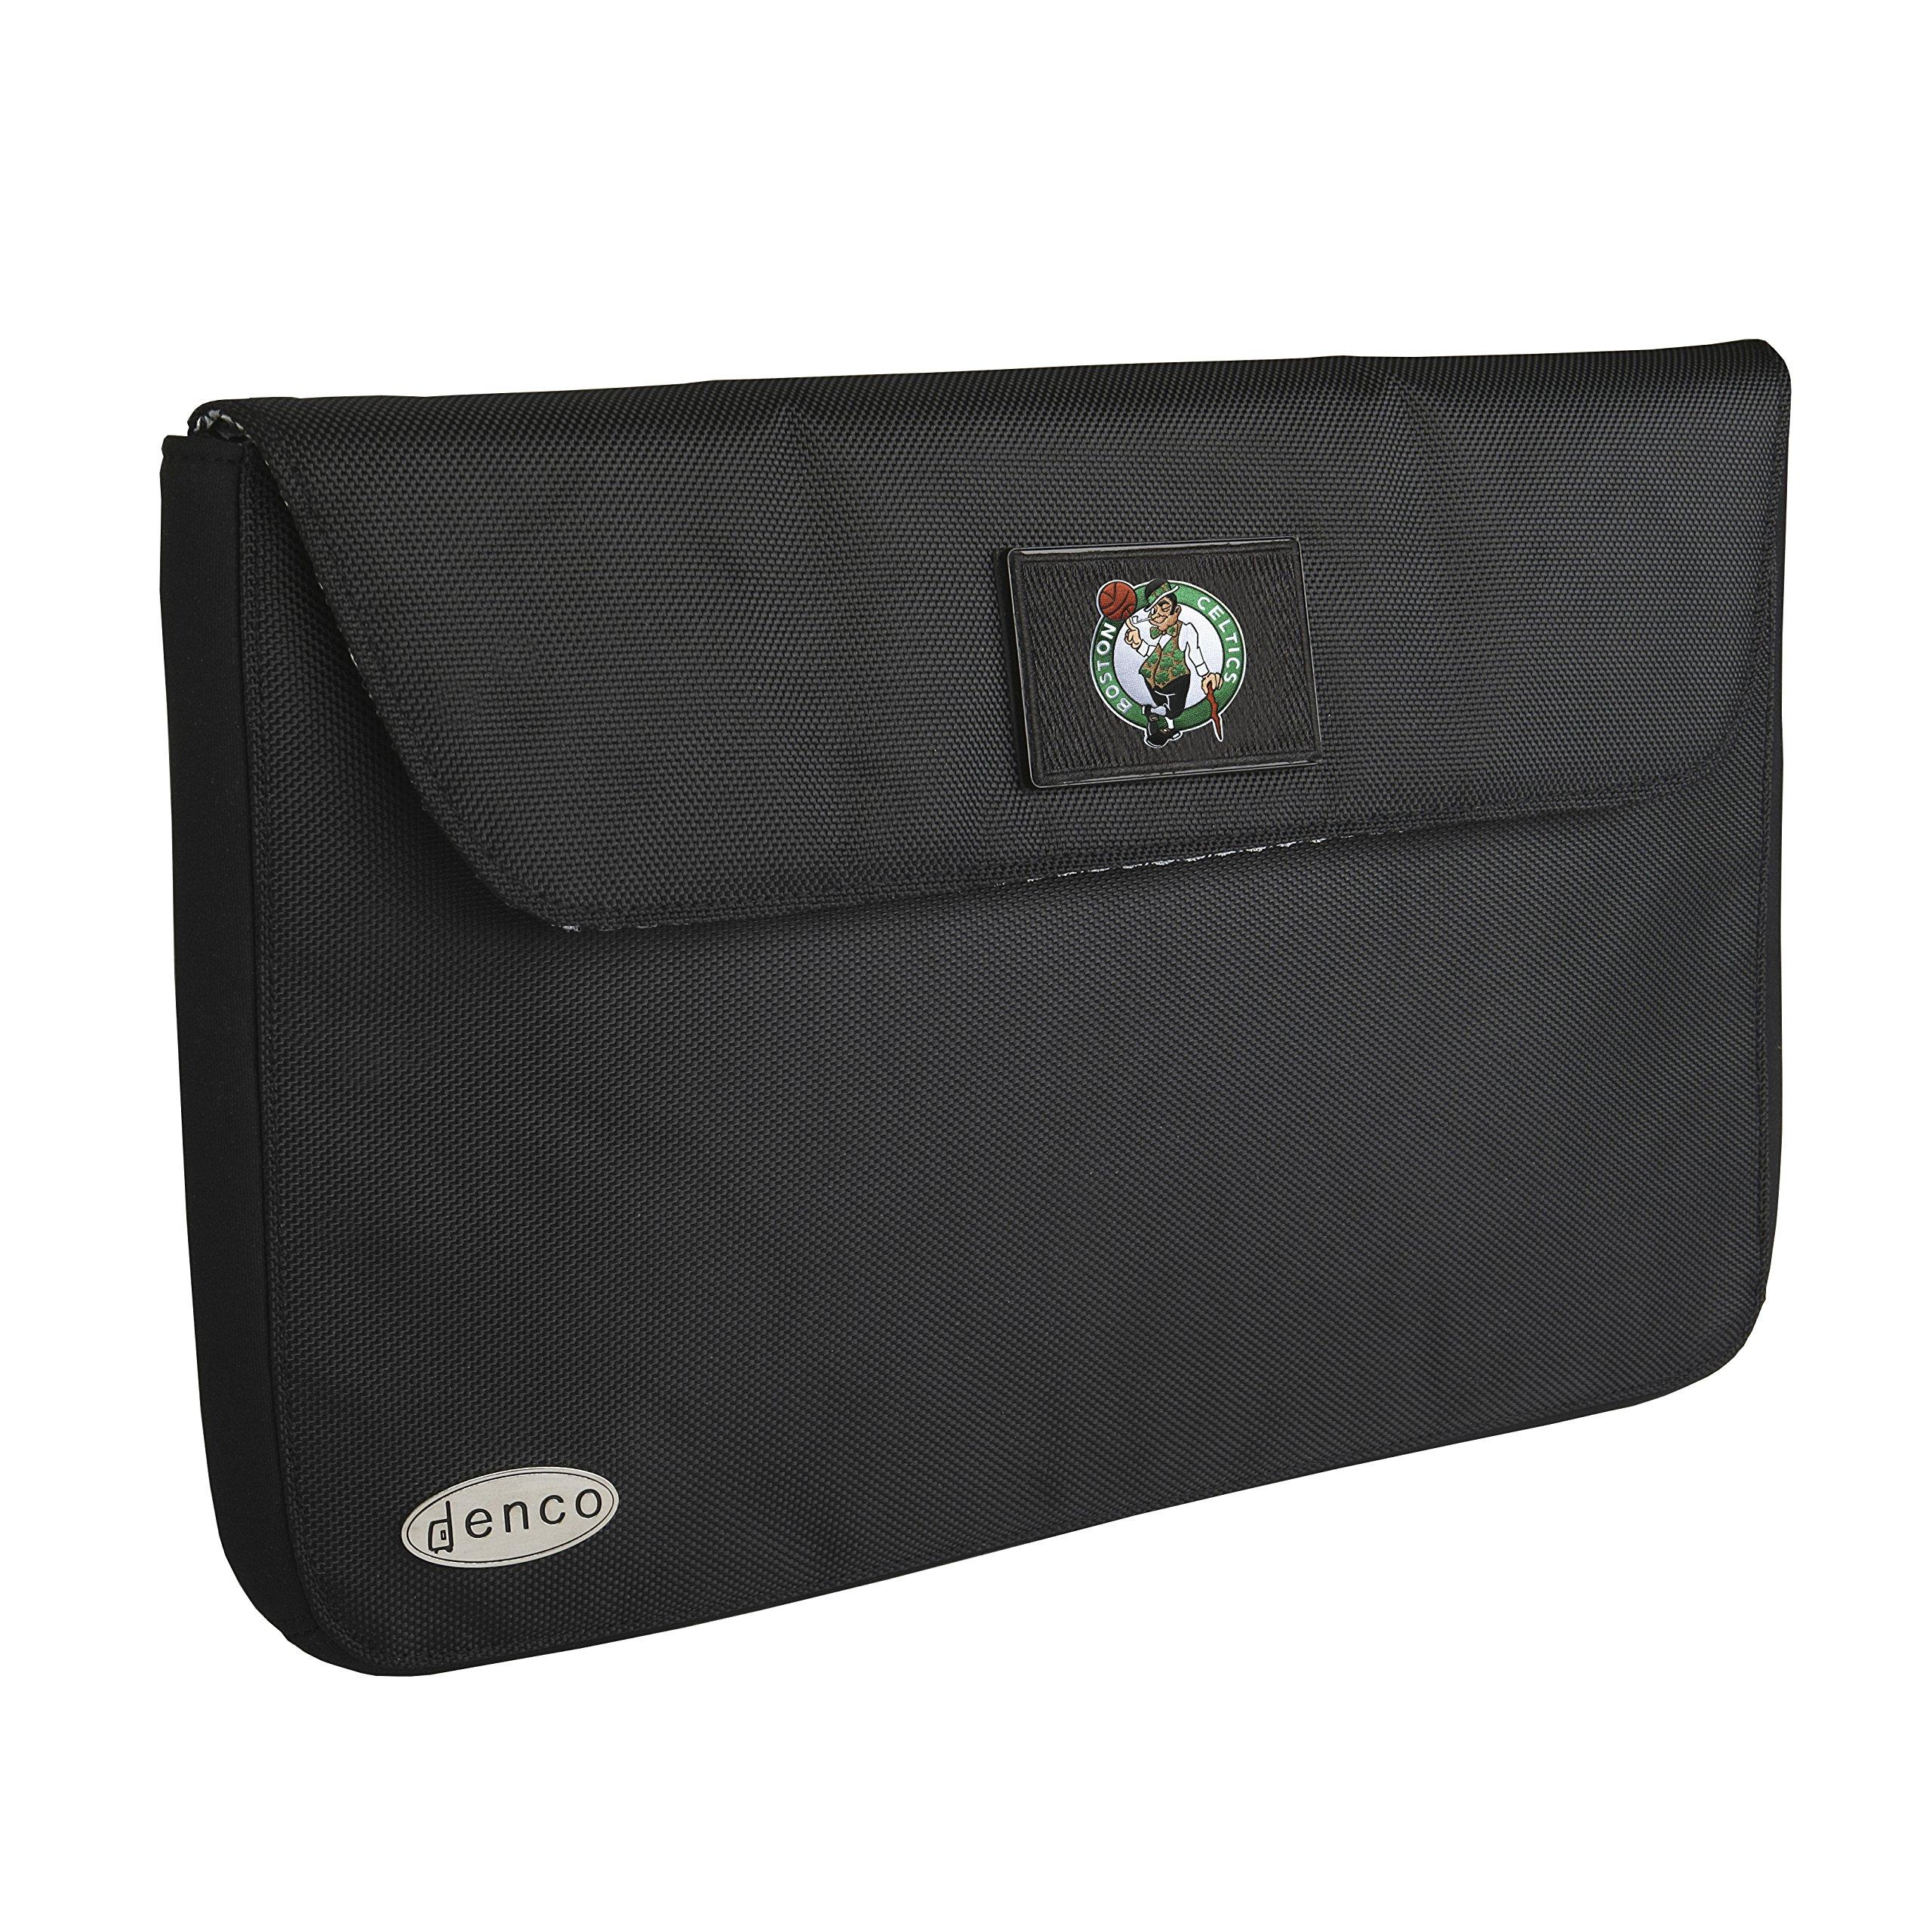 NBA Boston Celtics Laptop Case, 17-Inch, Black